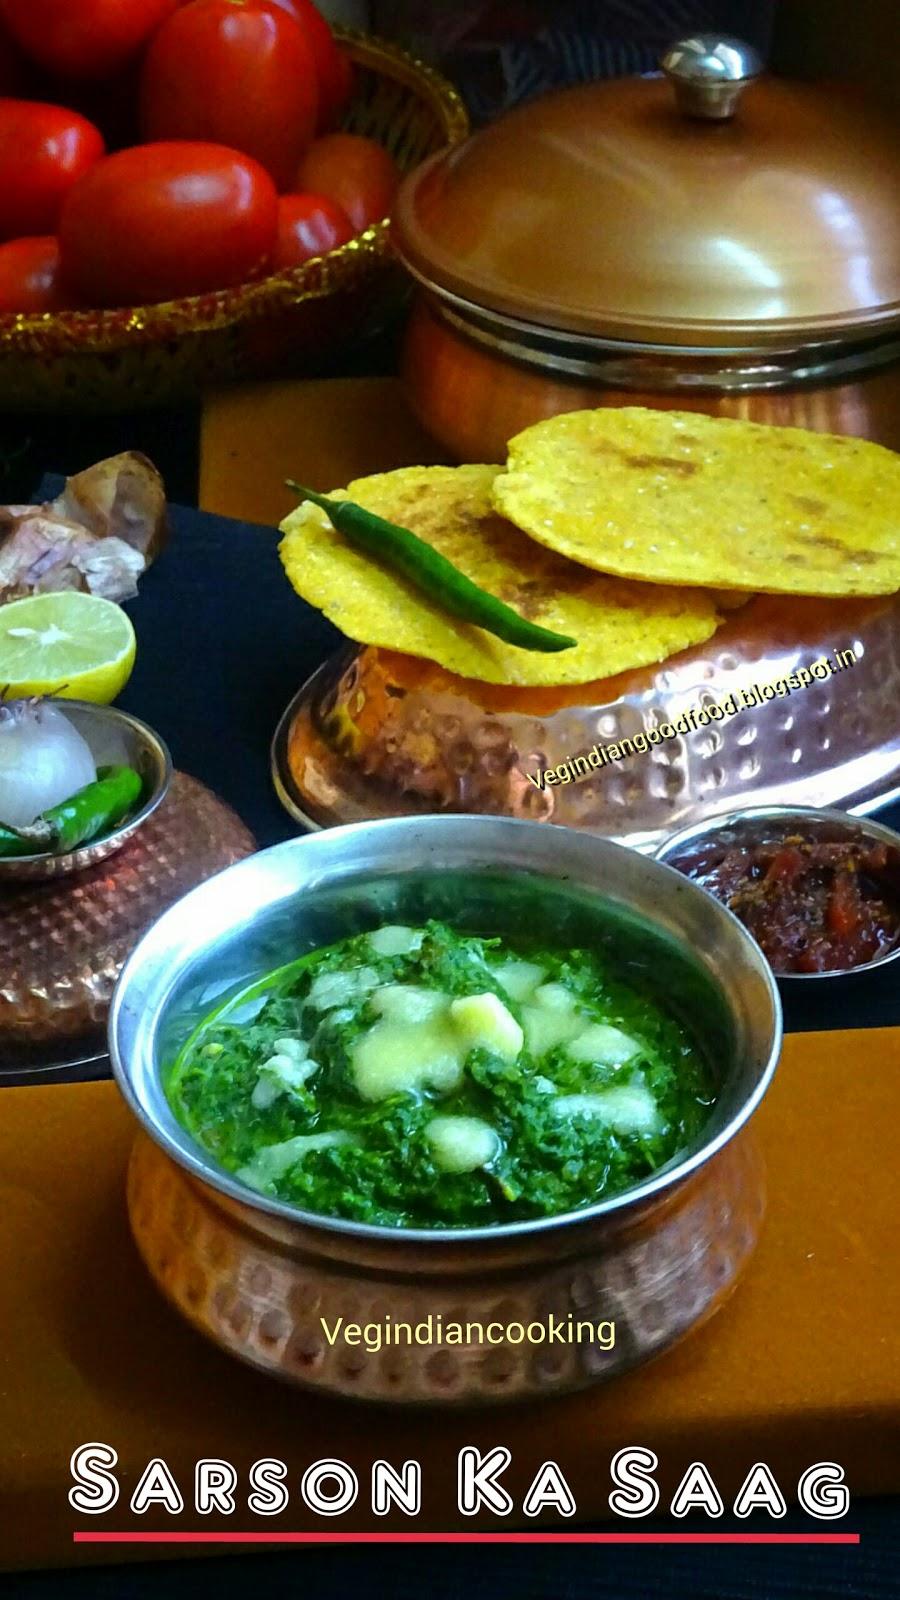 Veg indian cooking sarson ka saag recipe details forumfinder Choice Image